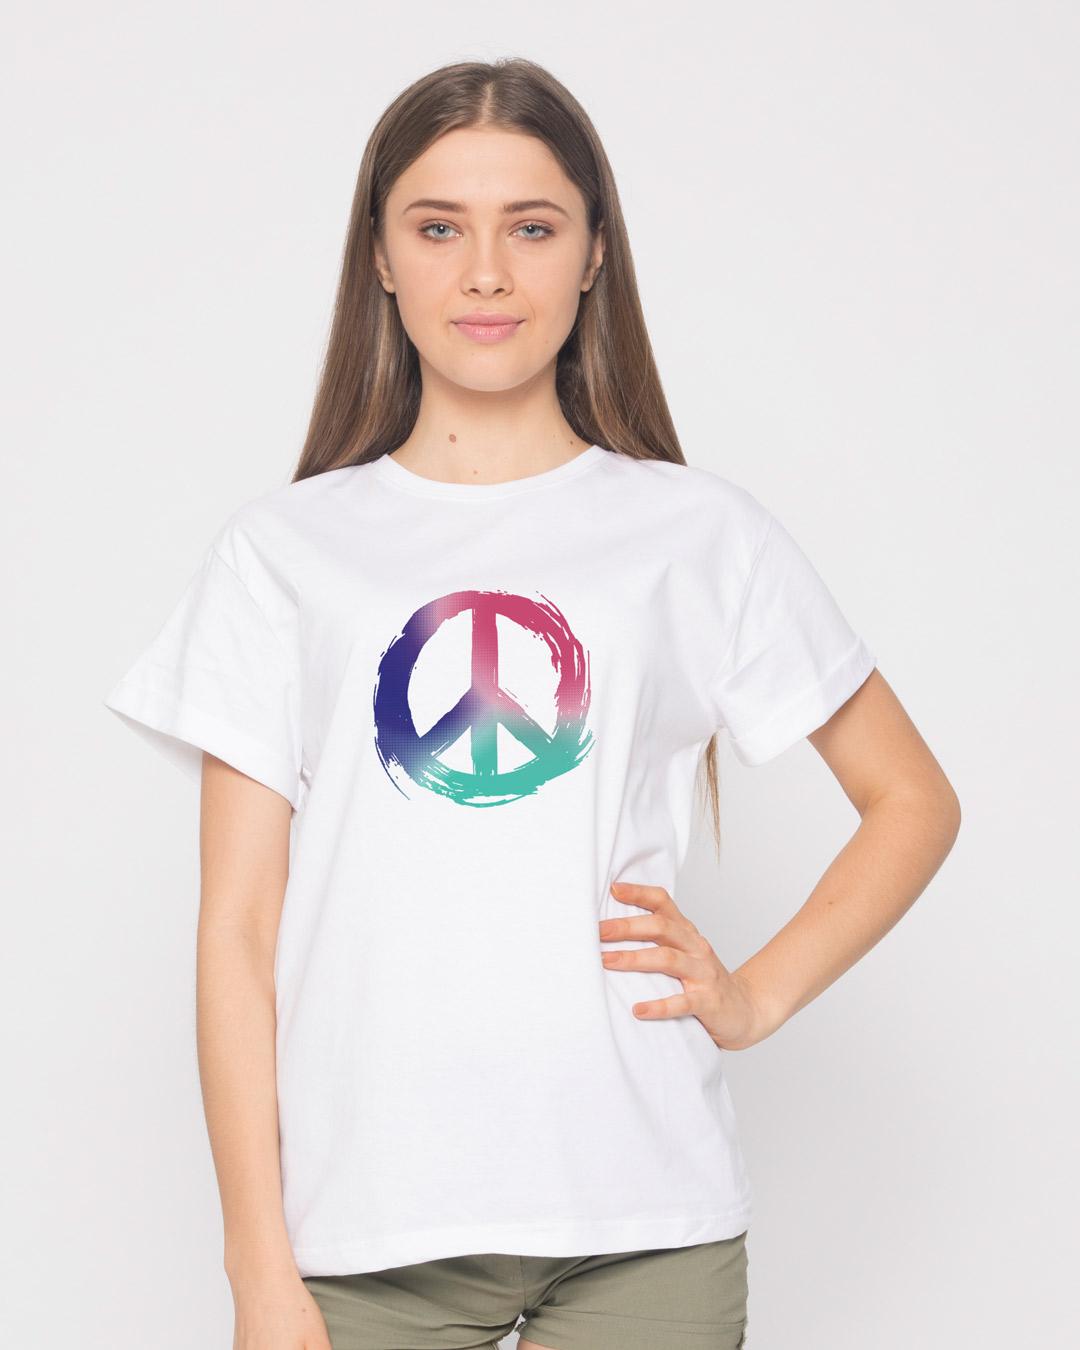 Colors of Peace Boyfriend T-Shirt - Colors of Peace Womens Boyfriend T- Shirts Best Price India - Bewakoof.com a656b8c83c